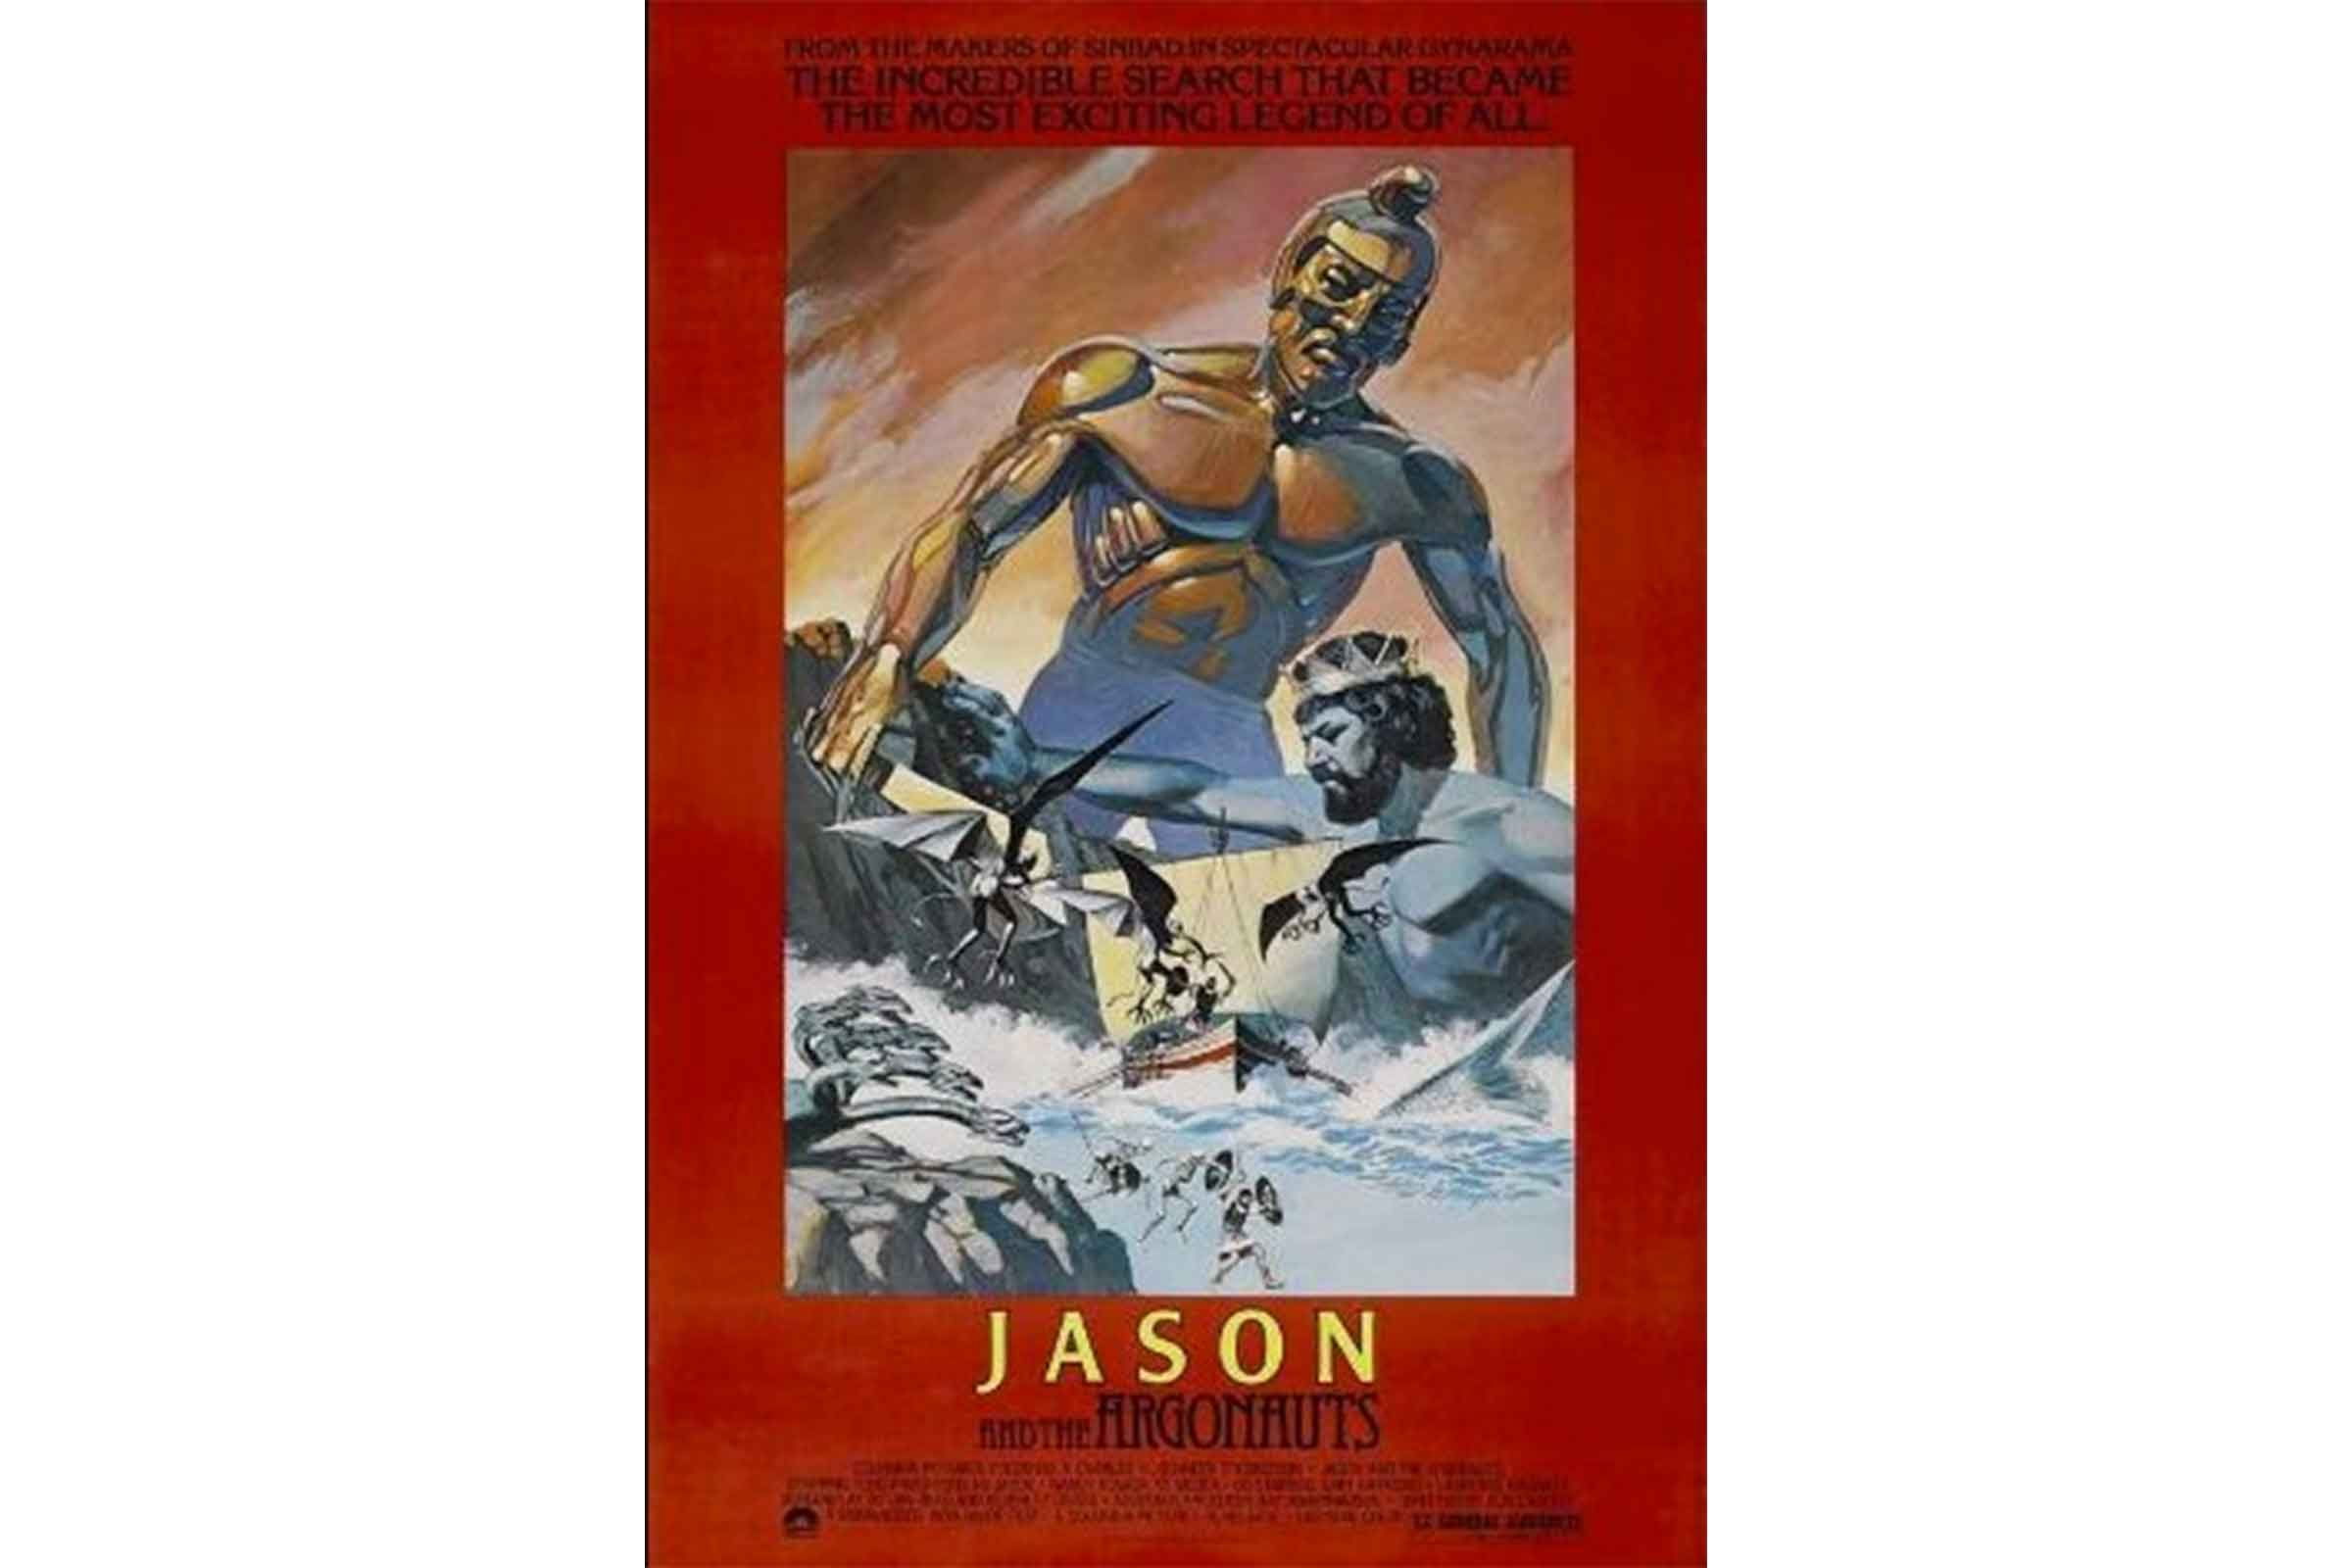 jason and the argonauts g - G Halloween Movies